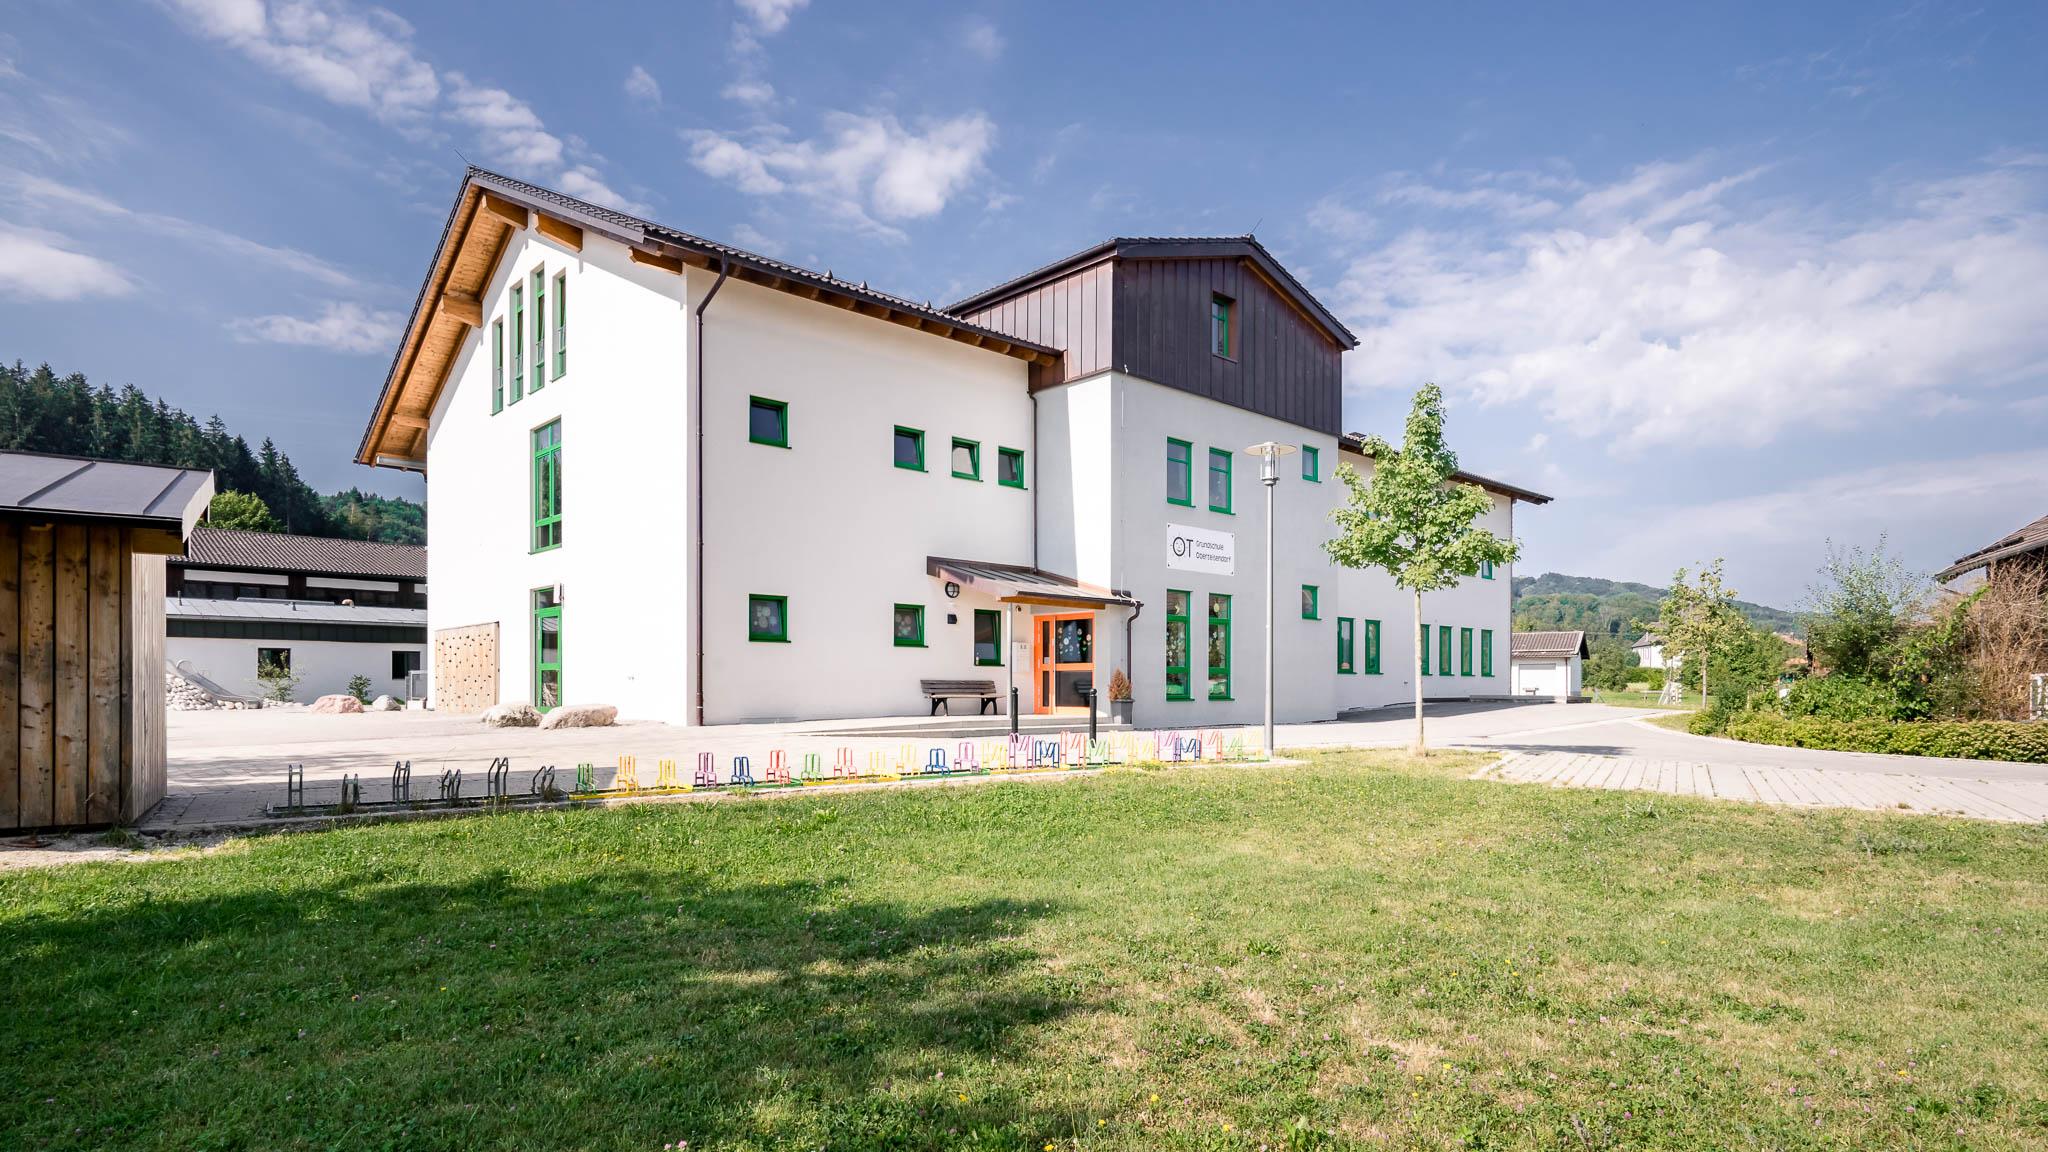 grundschule-oberteisendorf-bgl-baufirma-fuchs-1.jpg